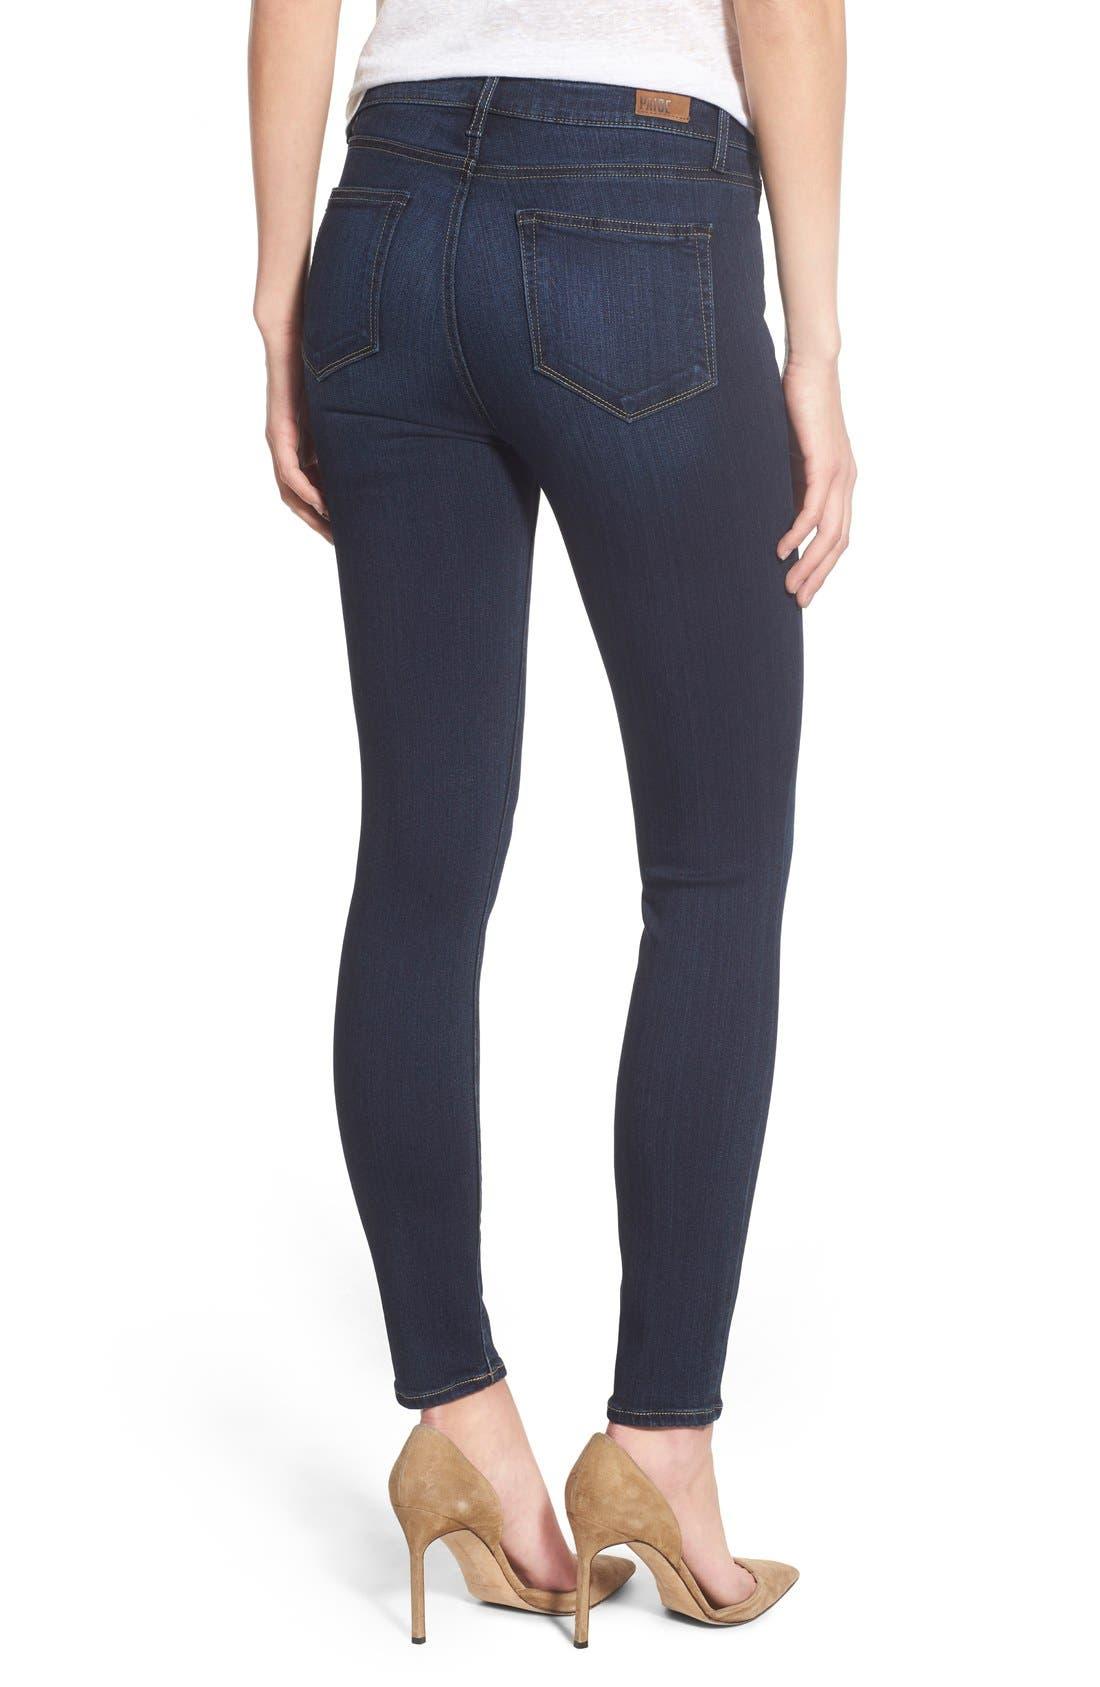 Transcend - Hoxton High Waist Ankle Ultra Skinny Jeans,                             Alternate thumbnail 4, color,                             HARTMANN